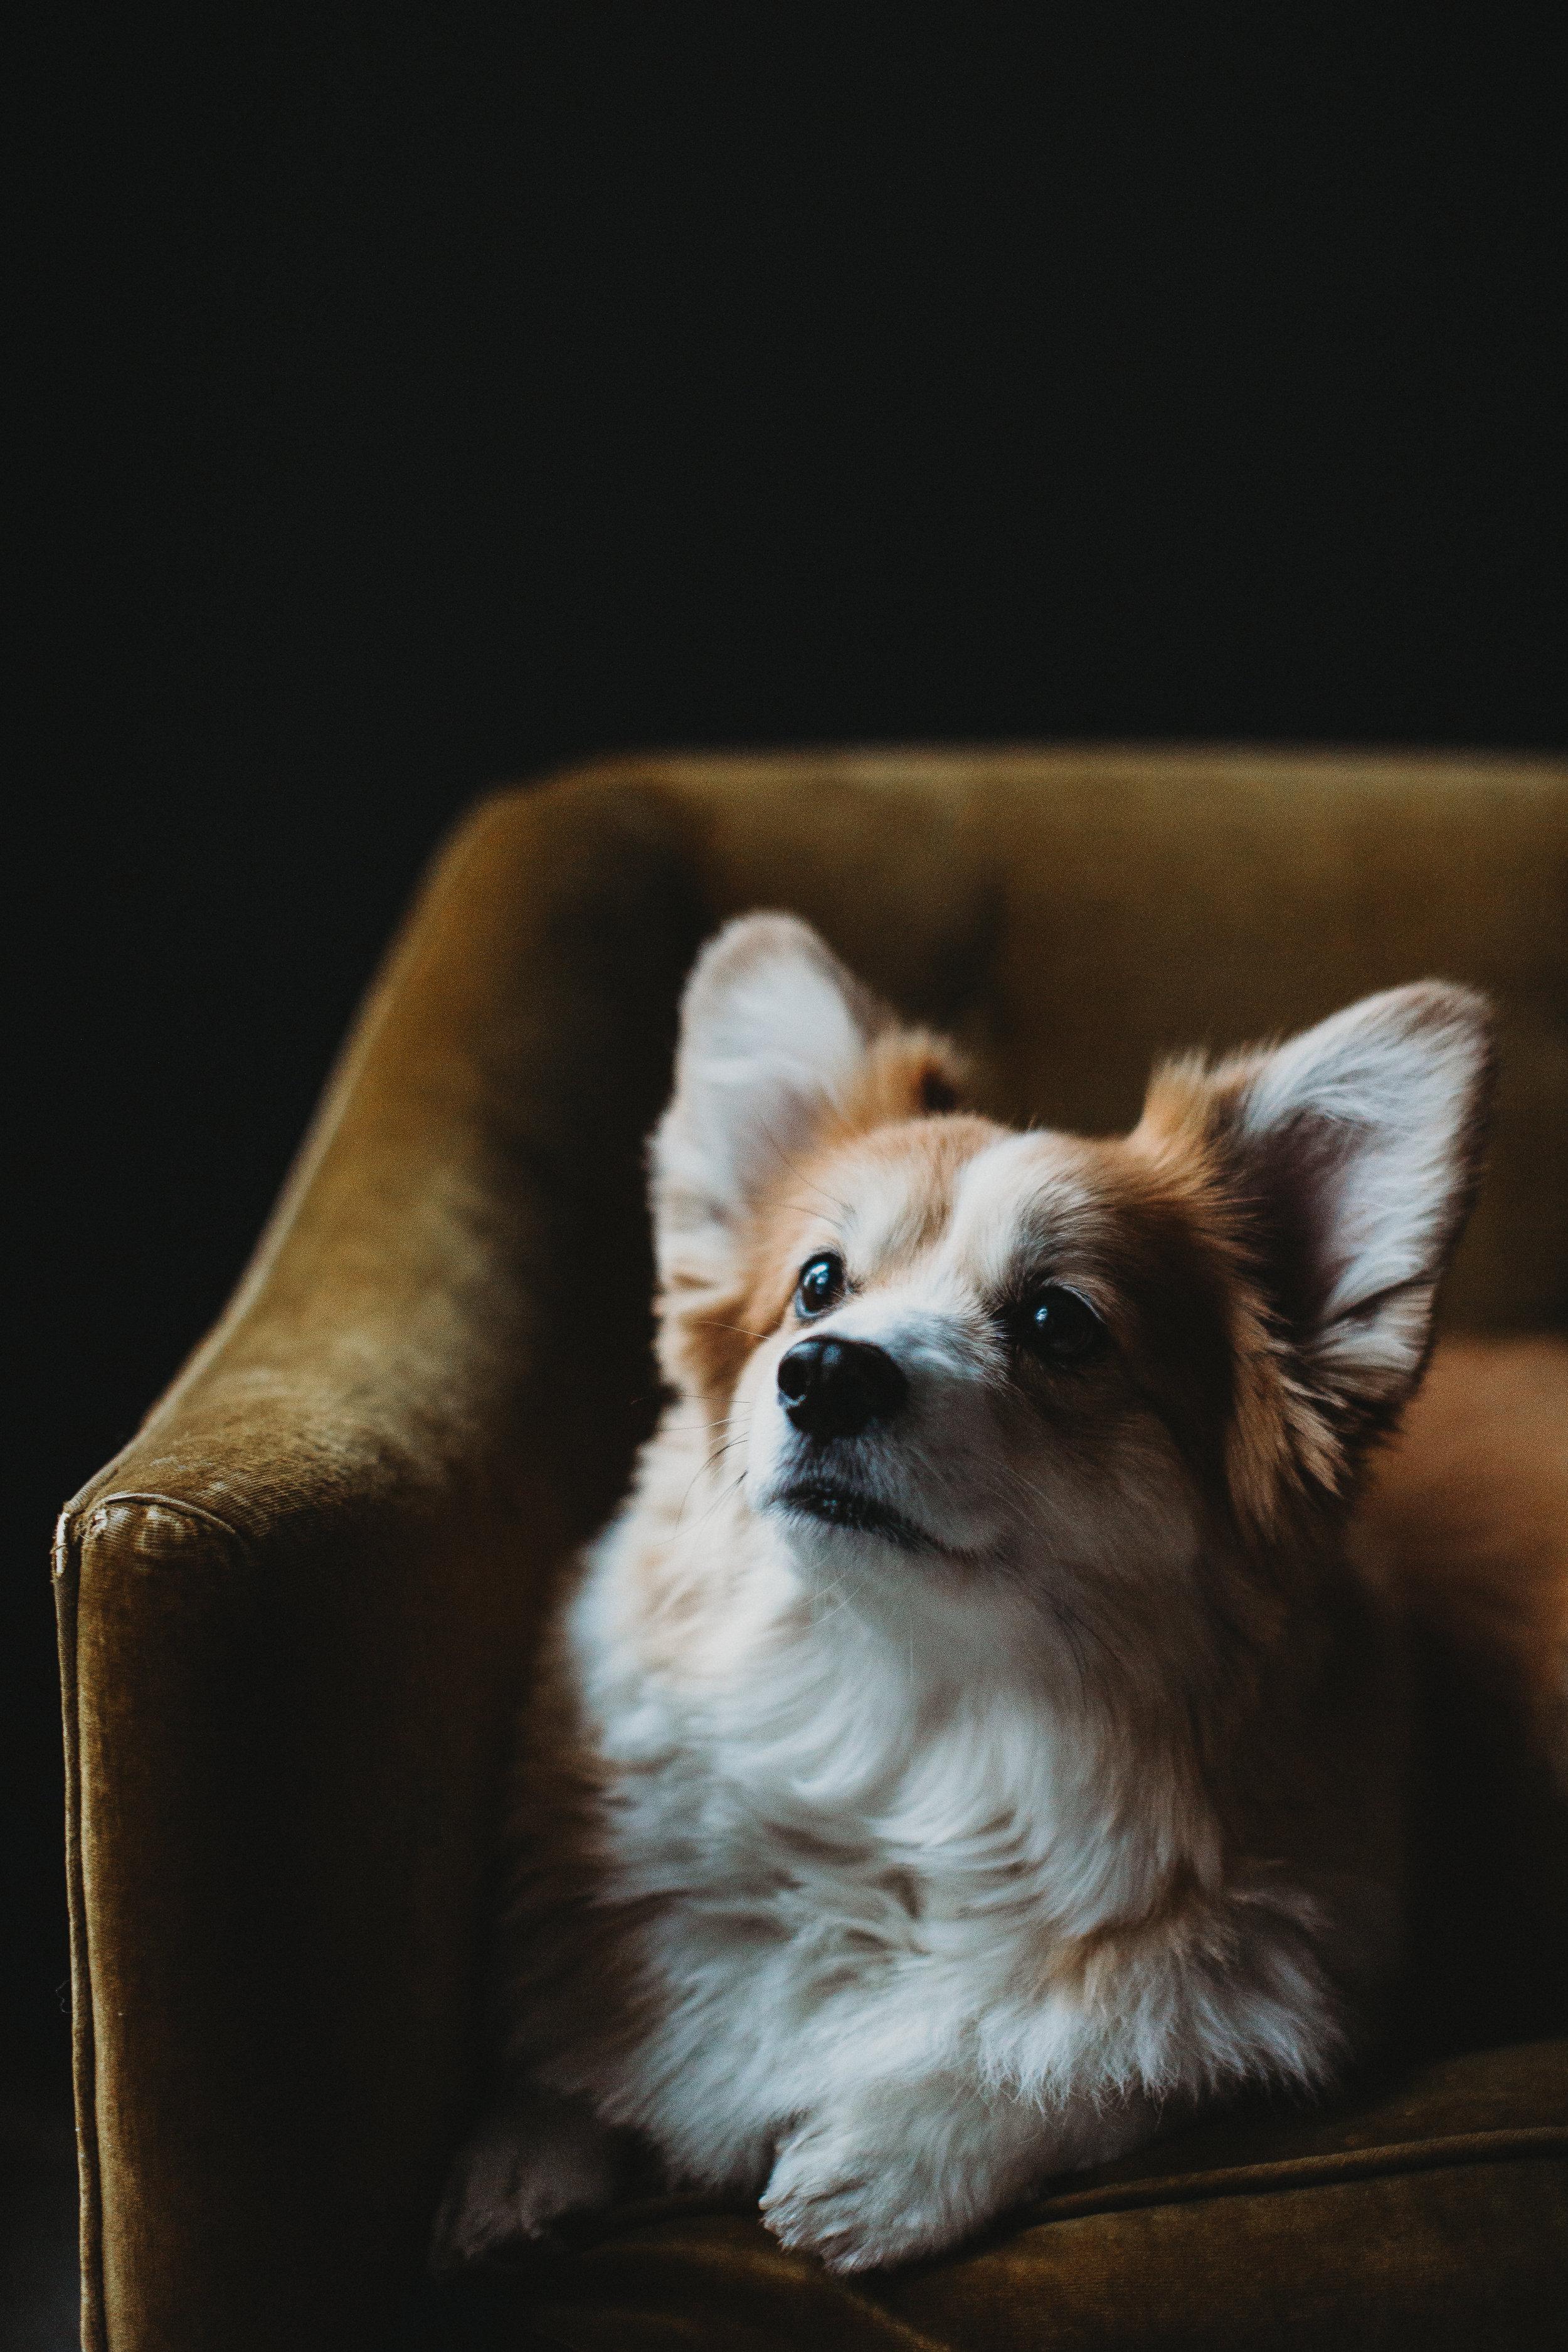 Using treats to get corgi in Boston family photos. Sudbury family photographer / pet photographer.